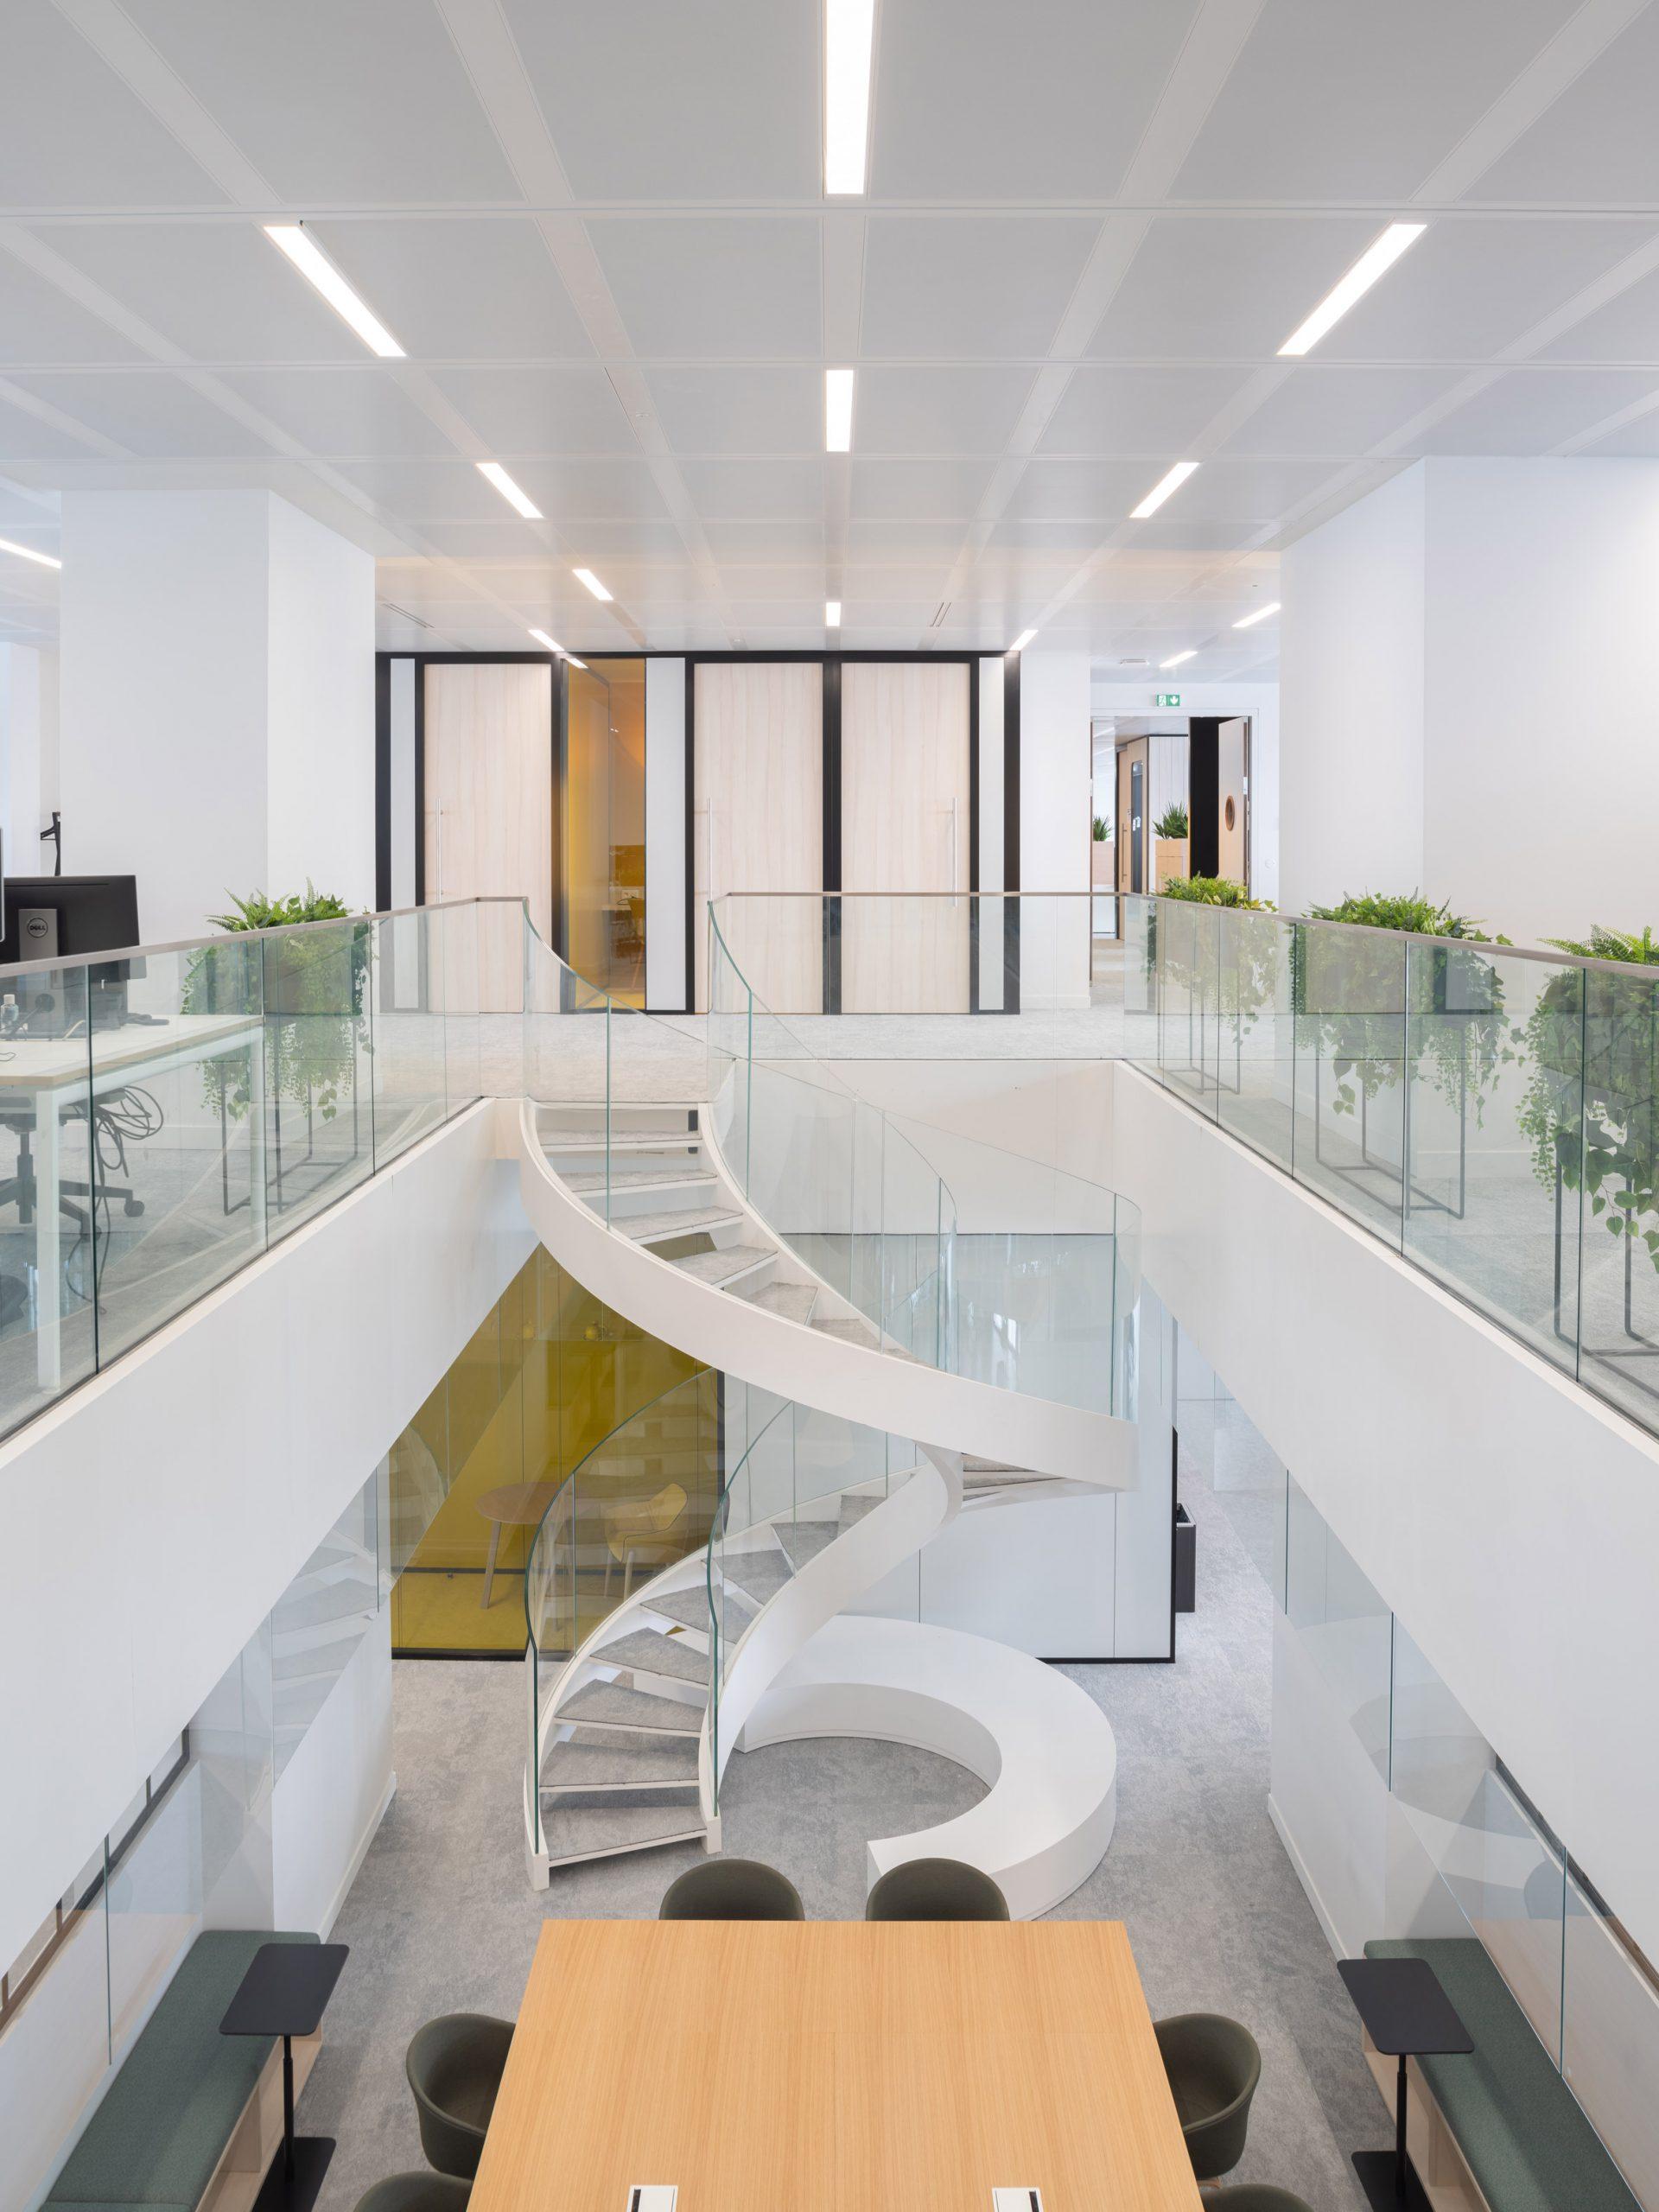 Le Monde's office within the Le Monde Headquarters in Paris by Snøhetta